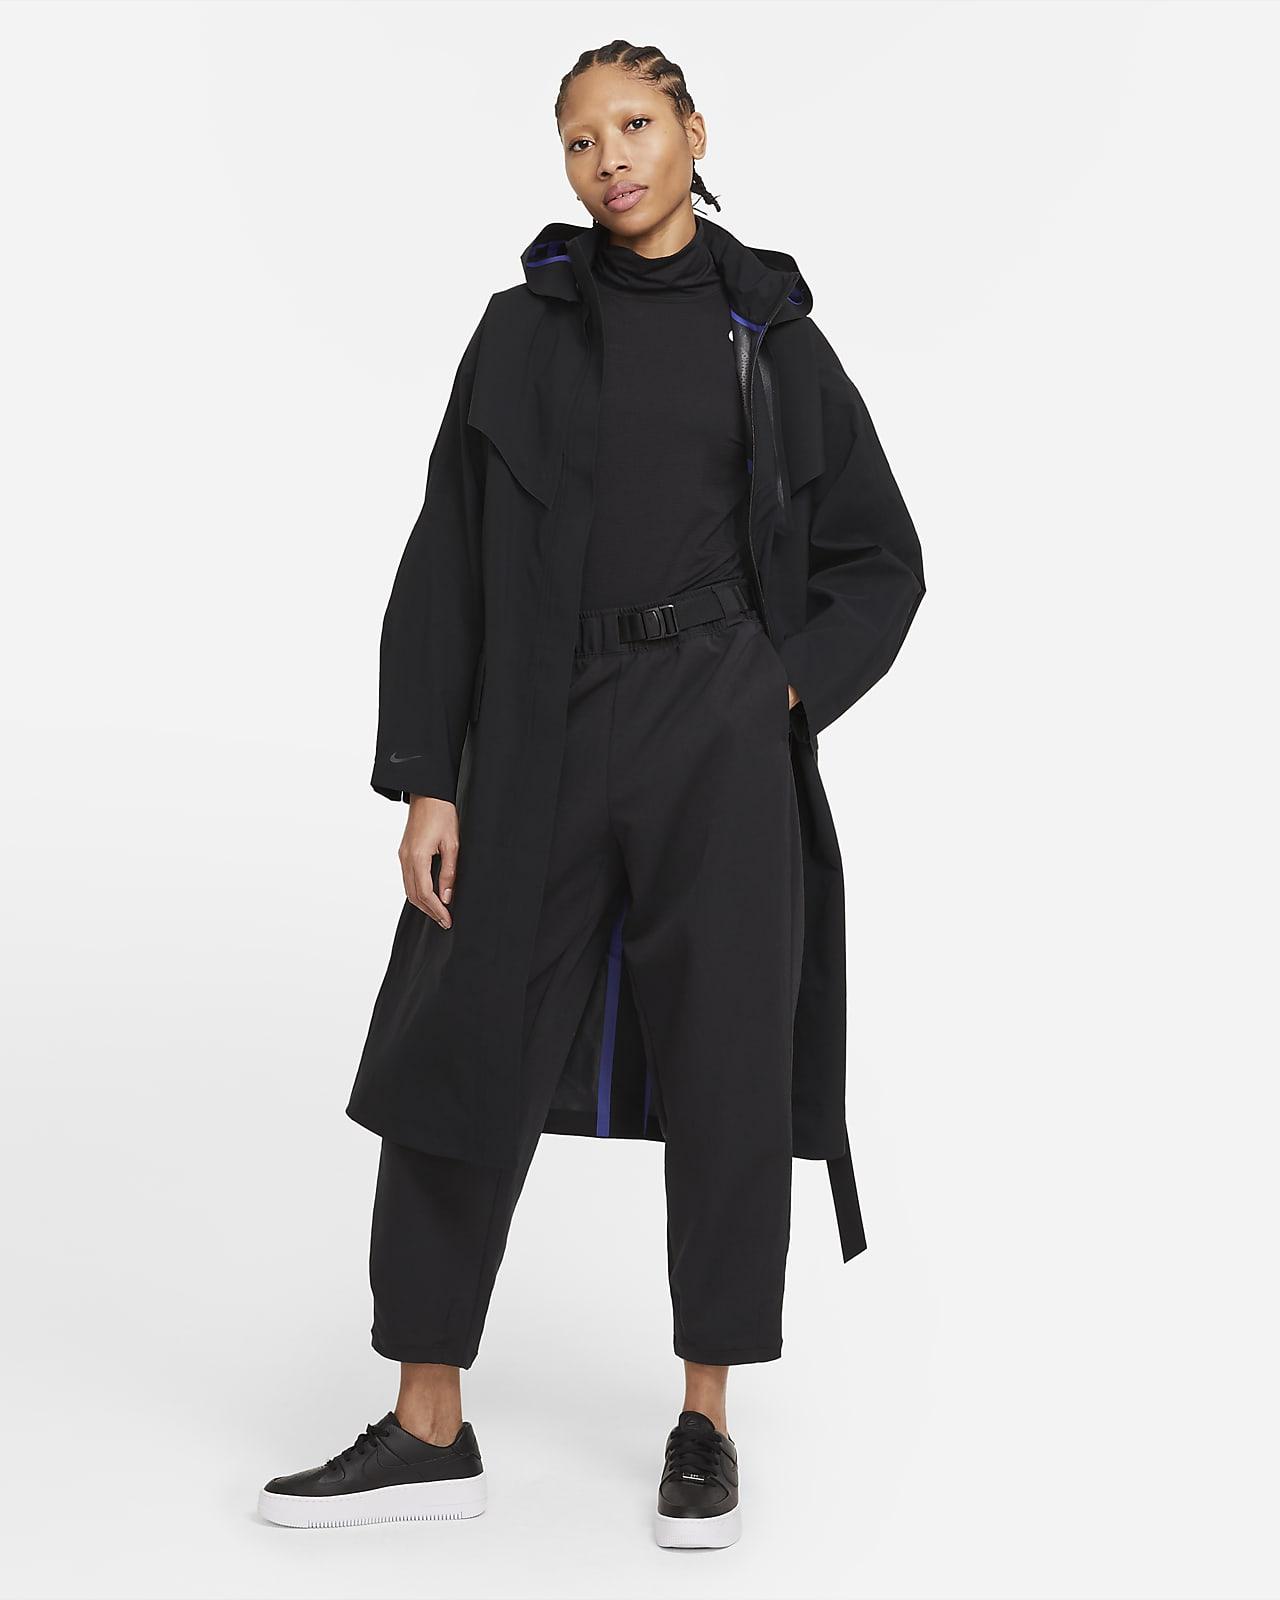 Chamarra para mujer Nike Sportswear Tech Pack